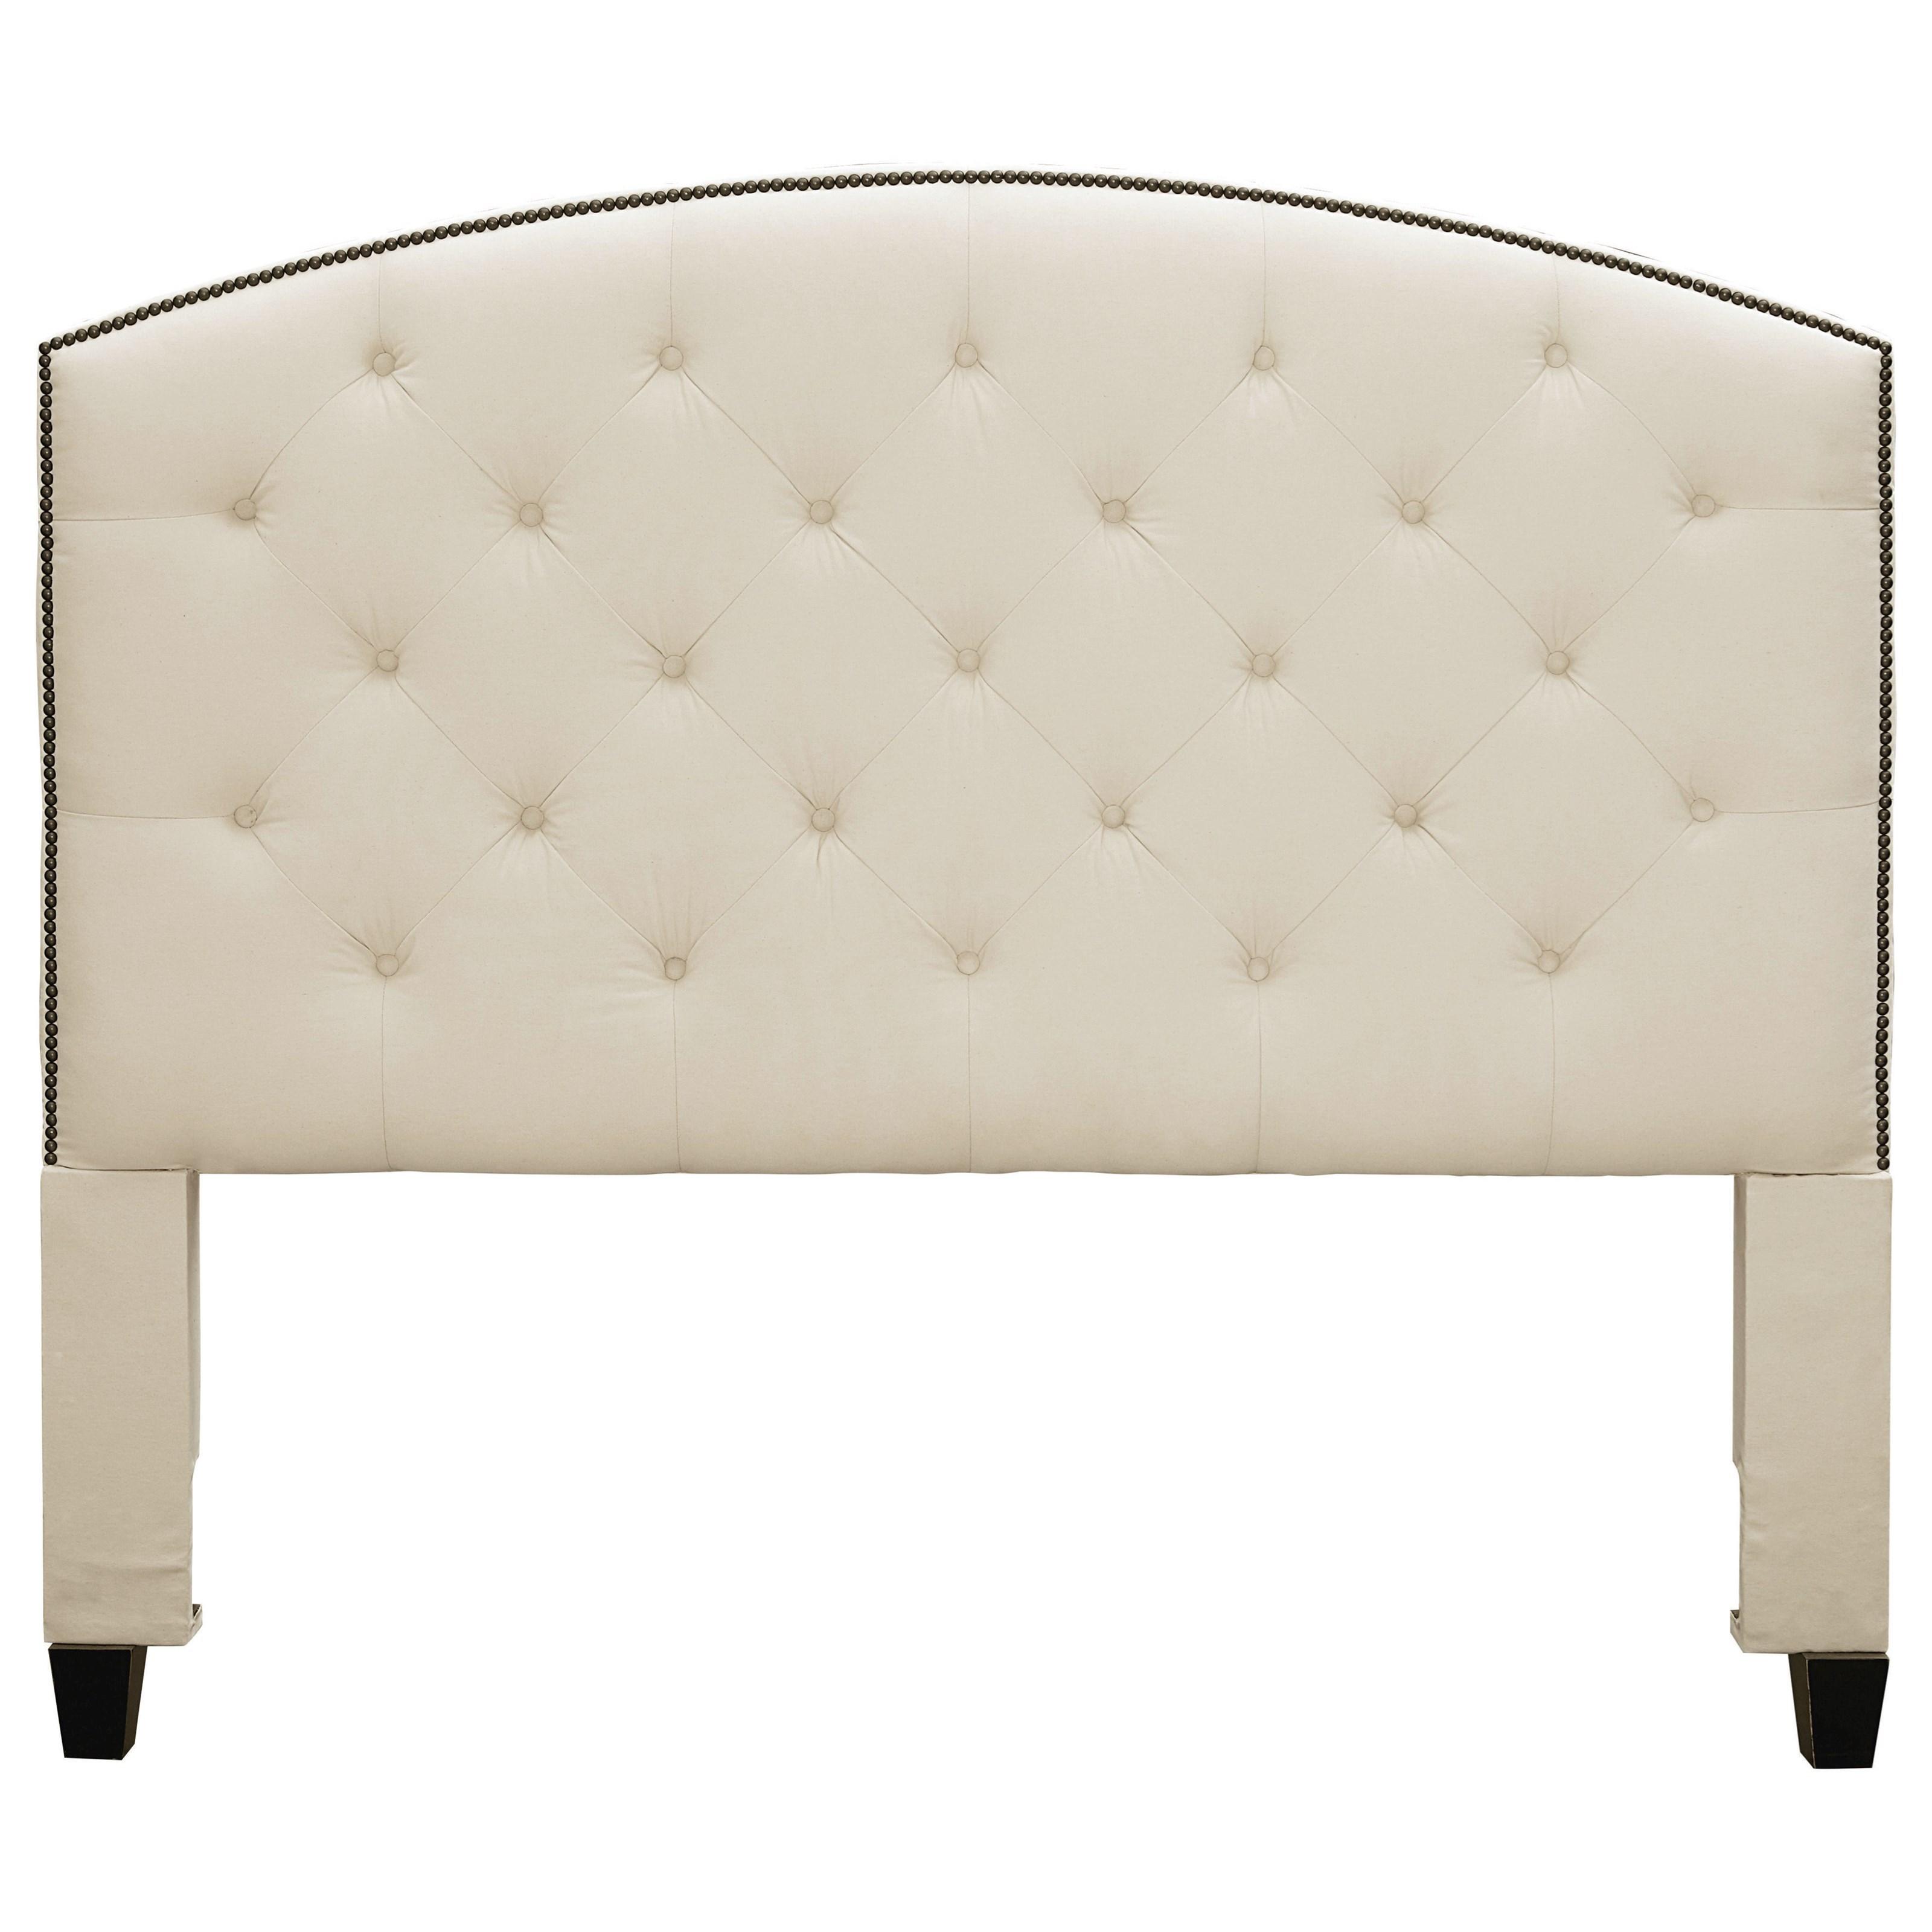 Savannah Upholstered Hdbd Twin by Bassett at H.L. Stephens